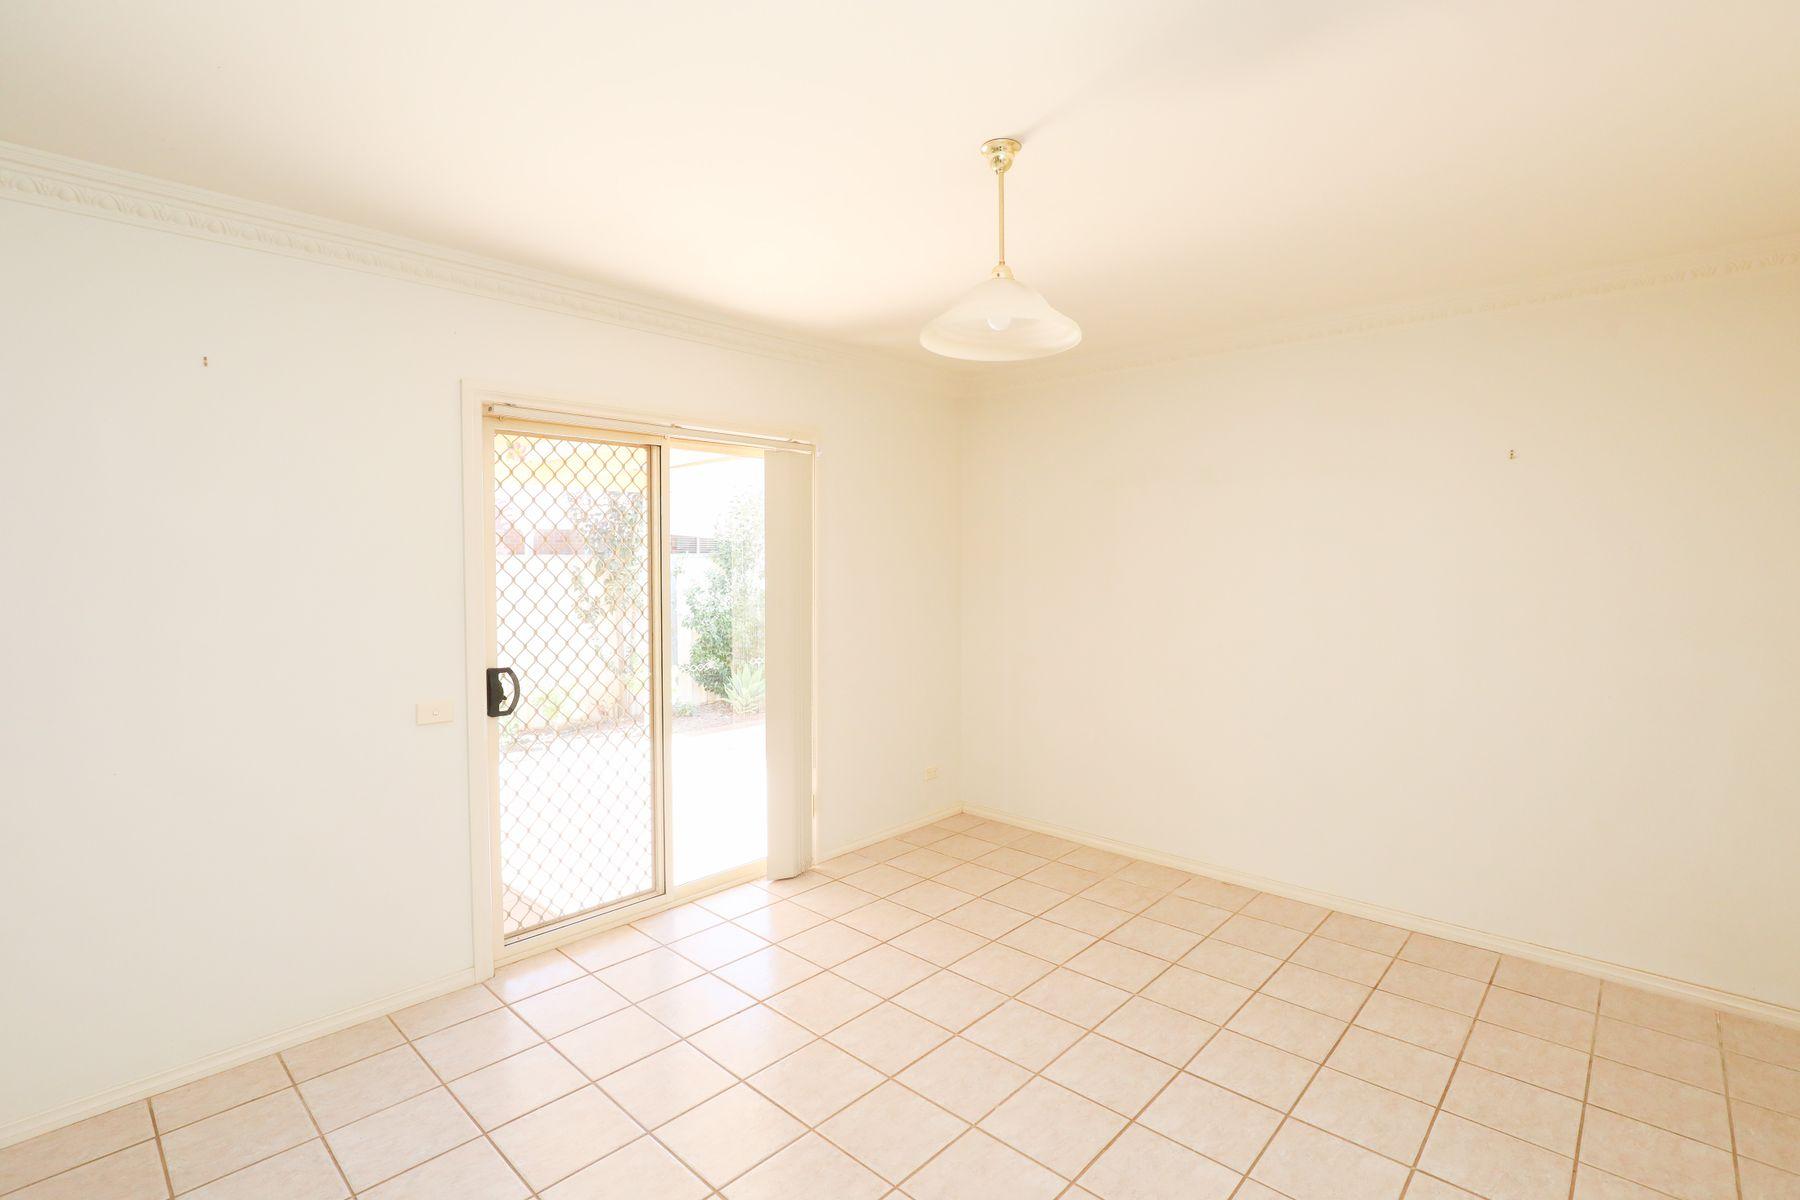 22 Brooks Drive, Mildura, VIC 3500